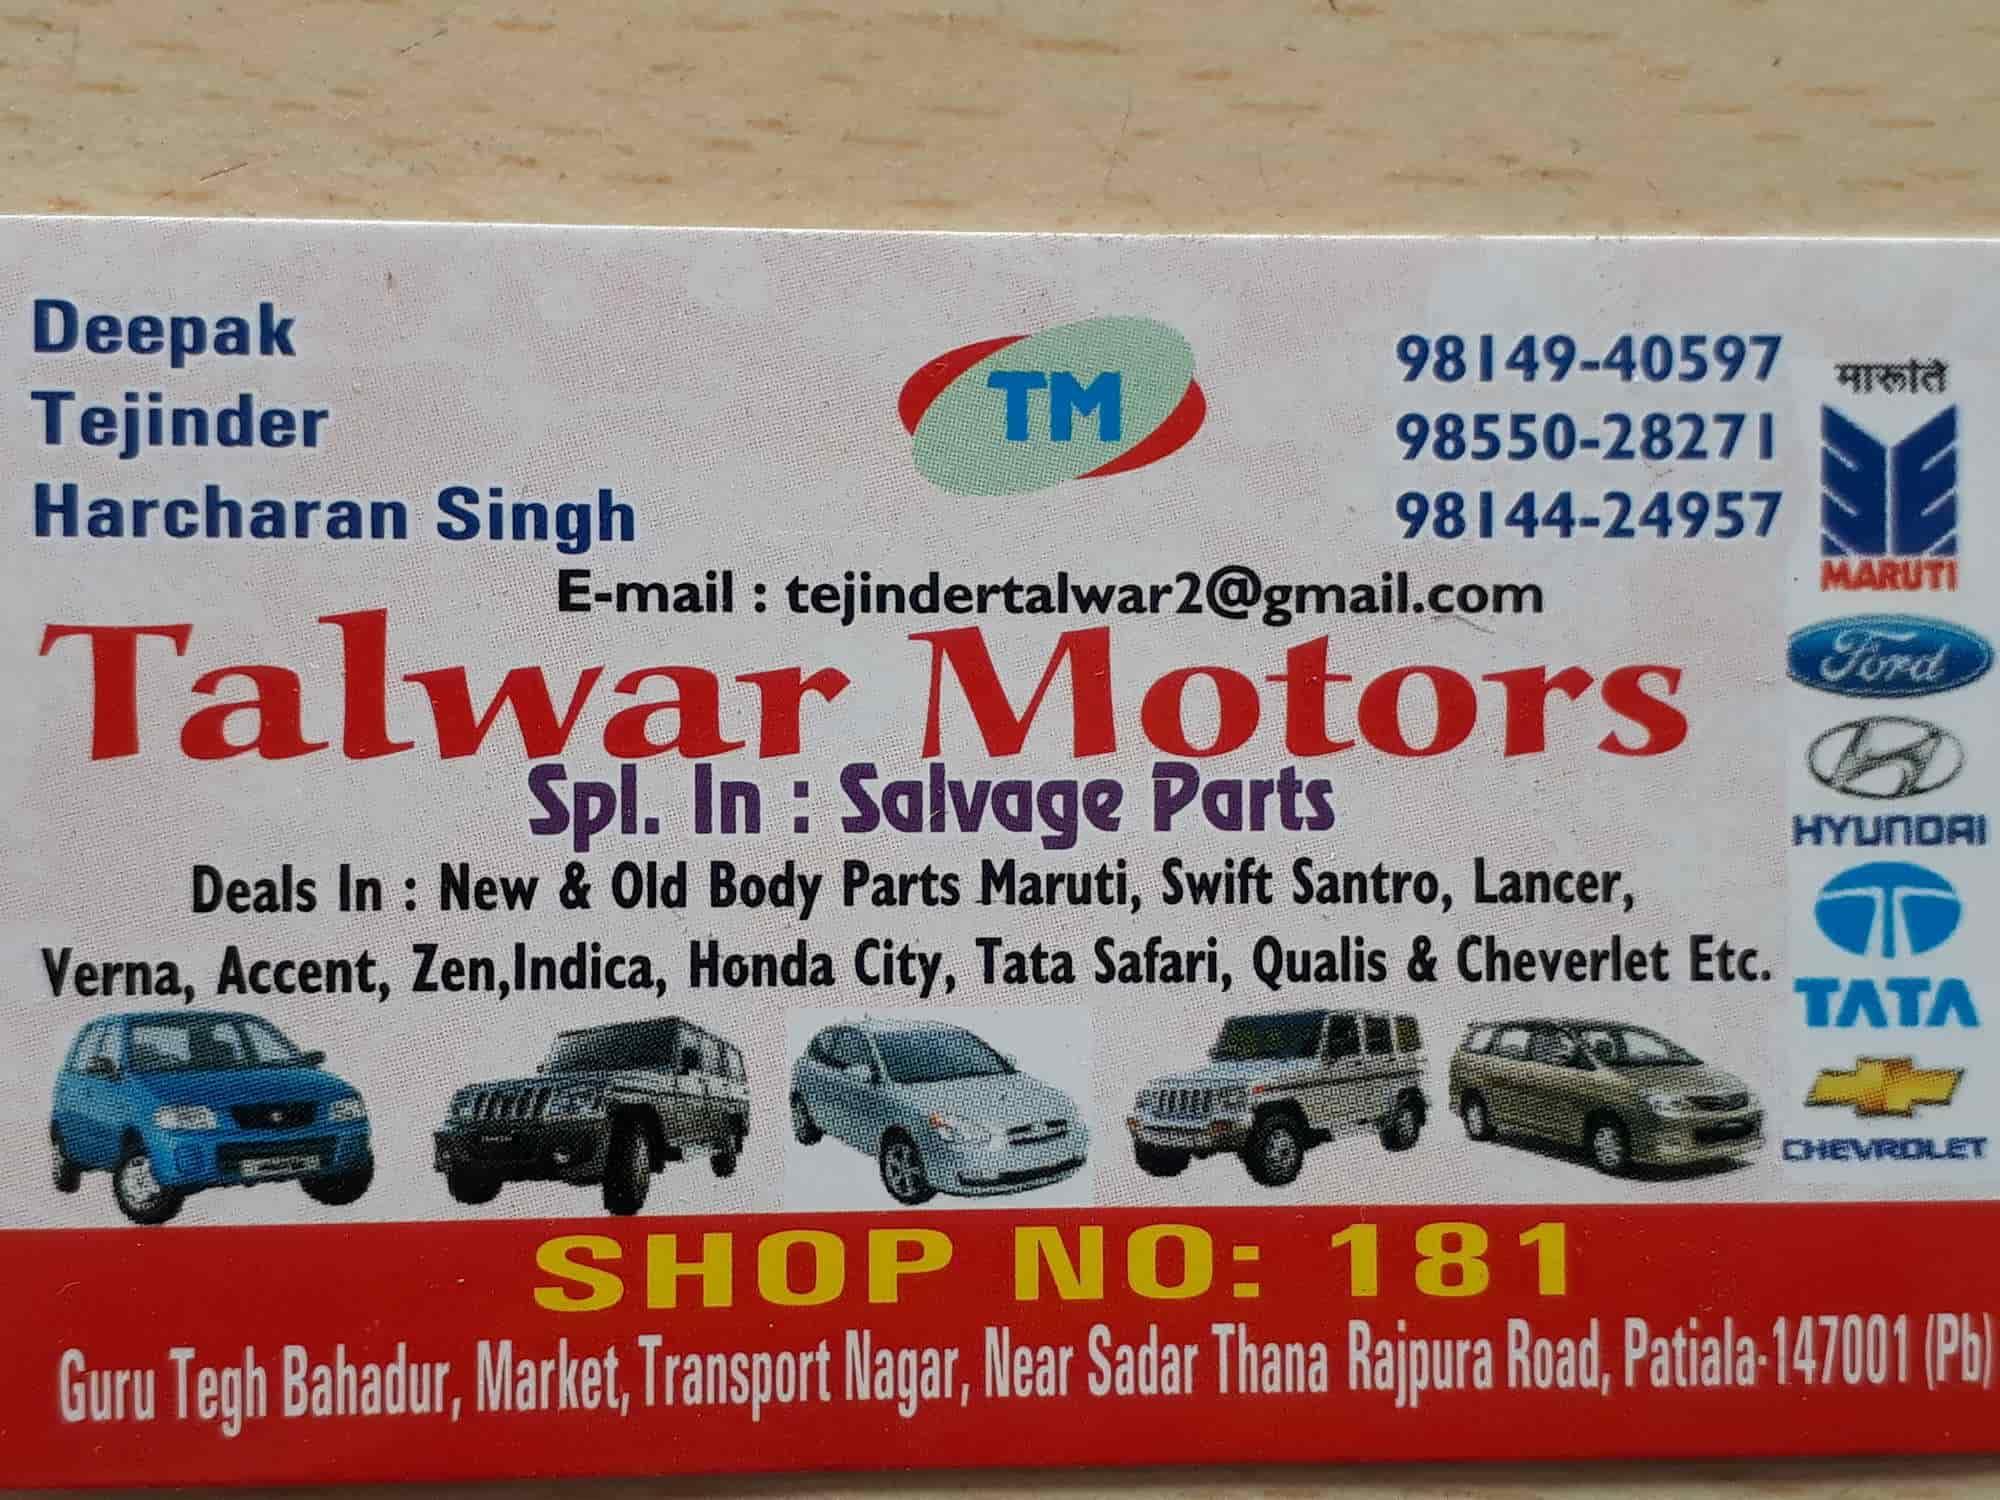 Talwar Motors A Complete Spare Parts Shop Photos Mathura Colony